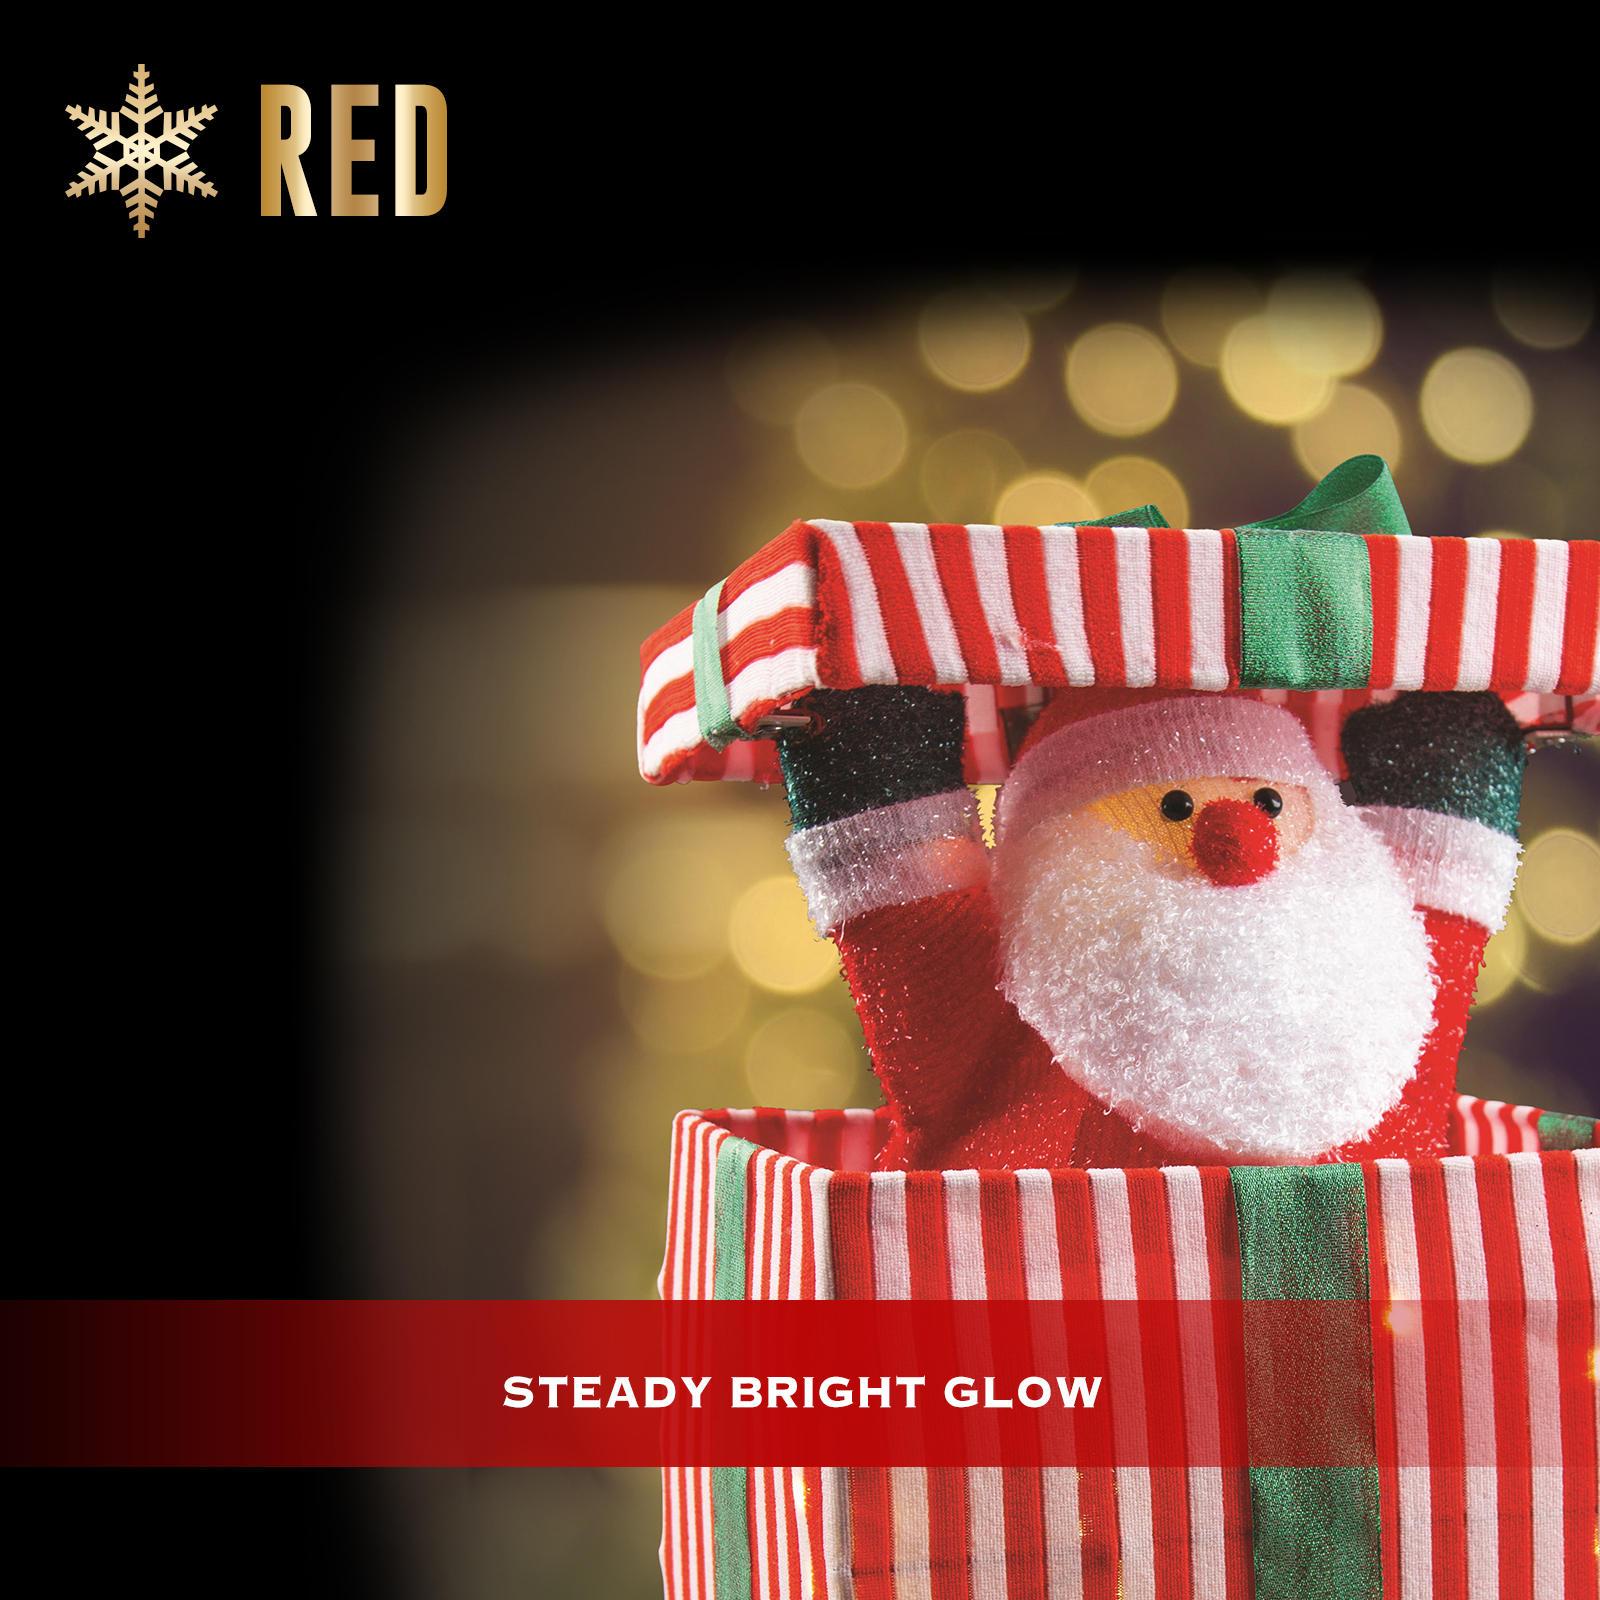 Christmas Lights 18 LEDs Pop UP Santa Claus Animated Indoor Xmas Decoration